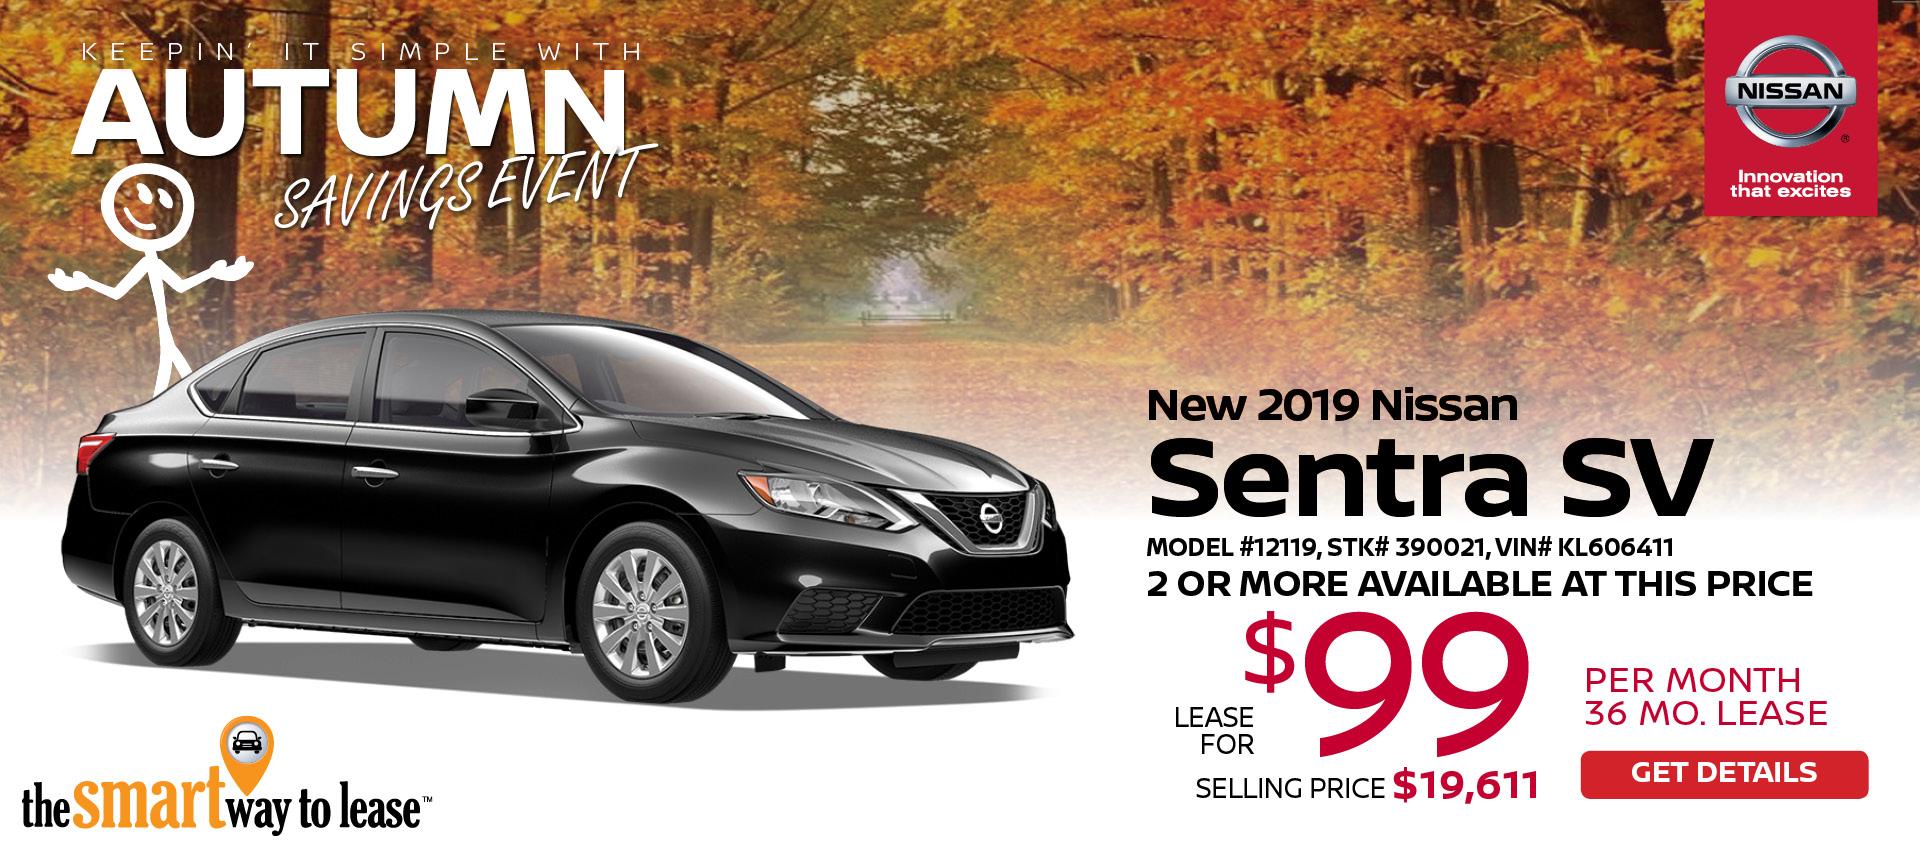 New U0026 Used Nissan Dealer Serving Newark, Elizabeth U0026 Union   Route ...